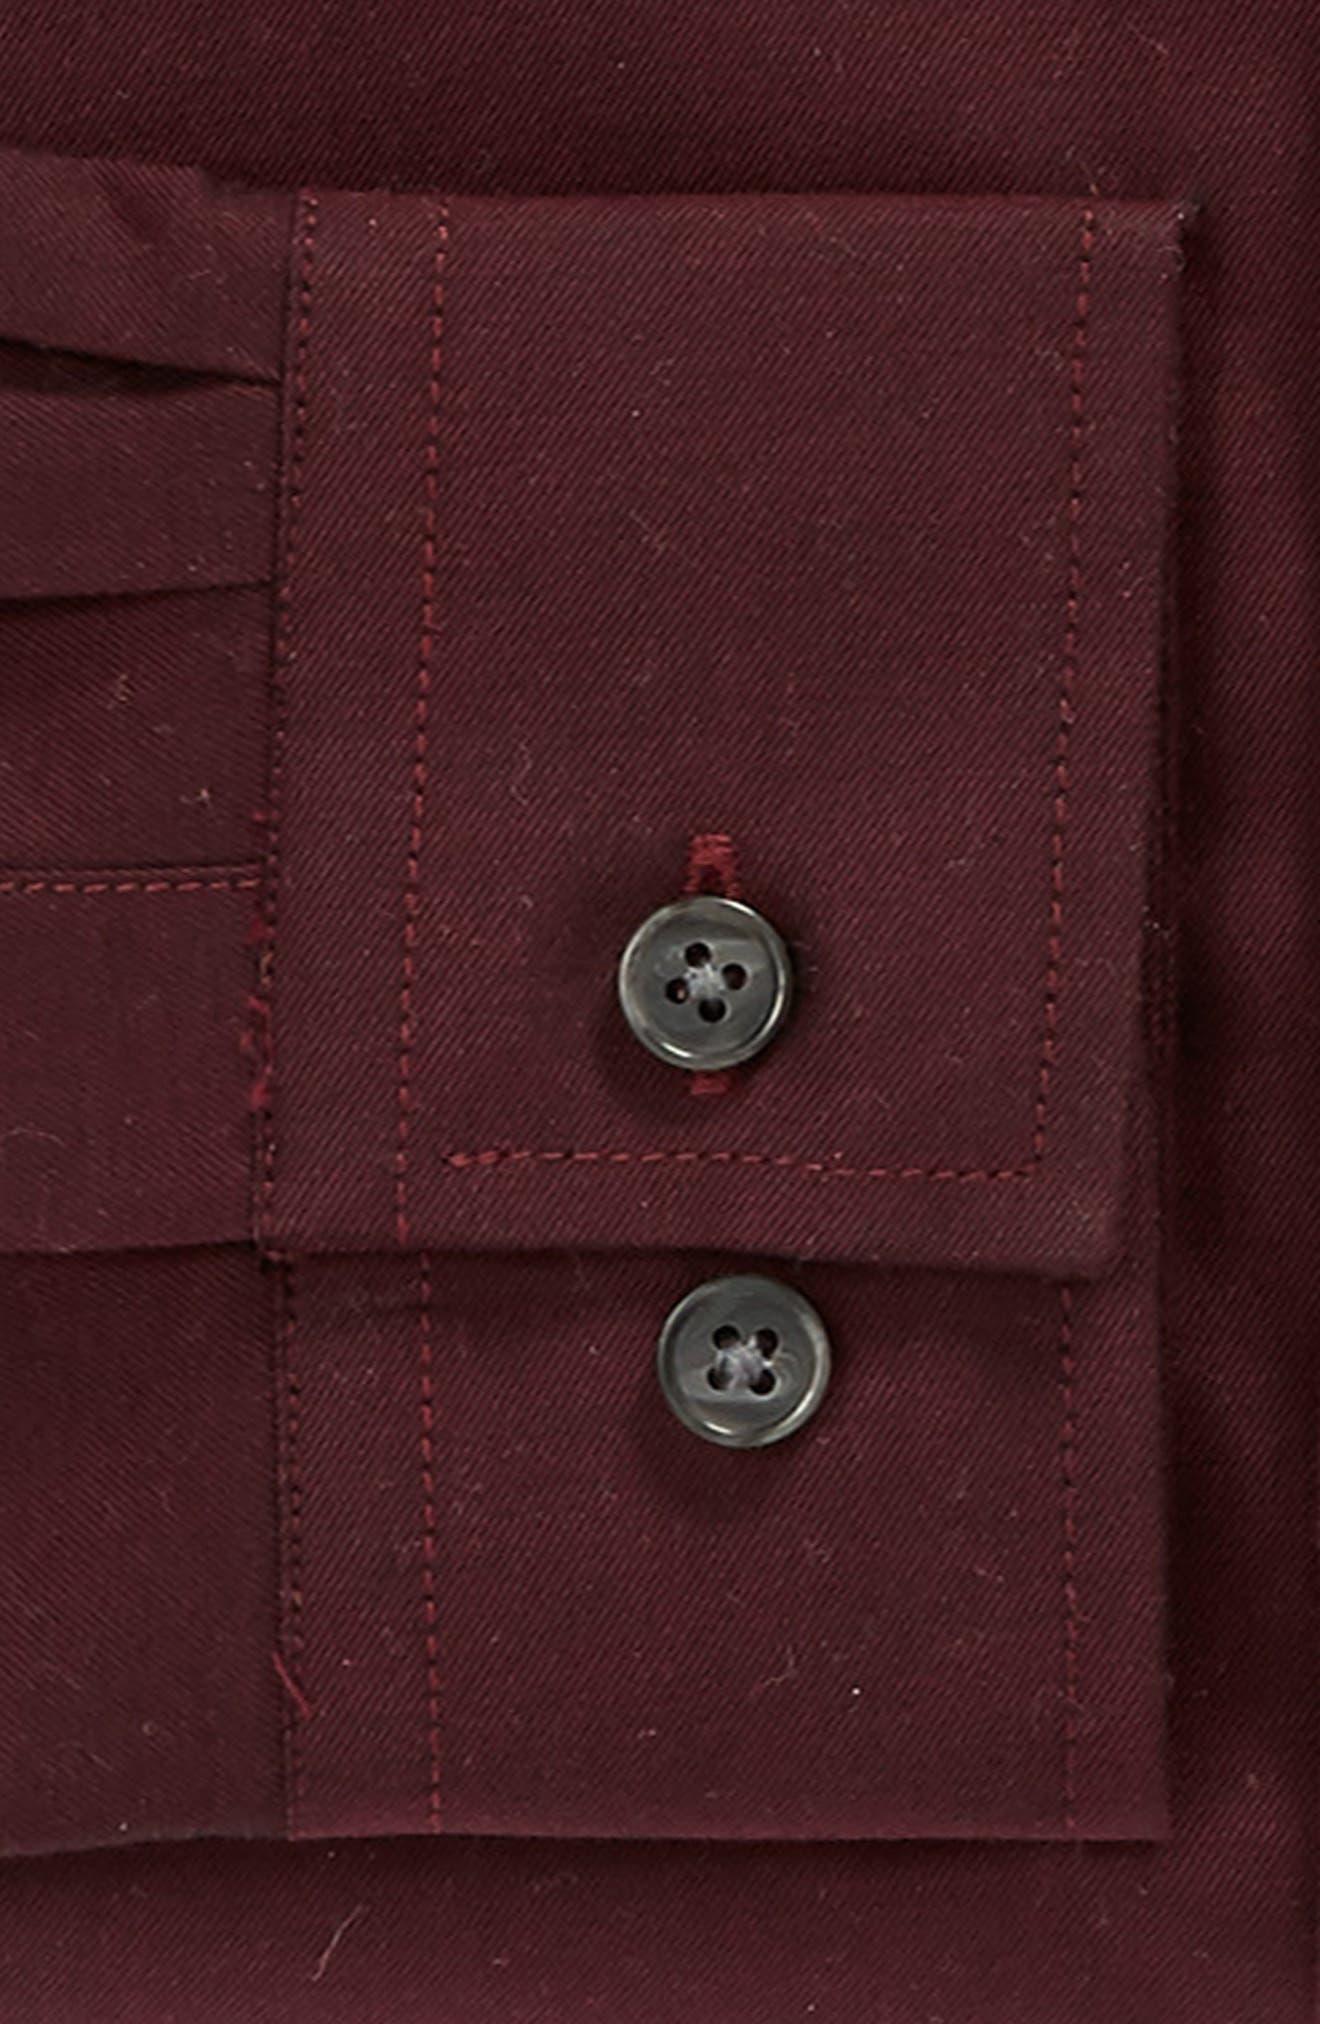 Trim Fit Solid Dress Shirt,                             Alternate thumbnail 3, color,                             Burgundy